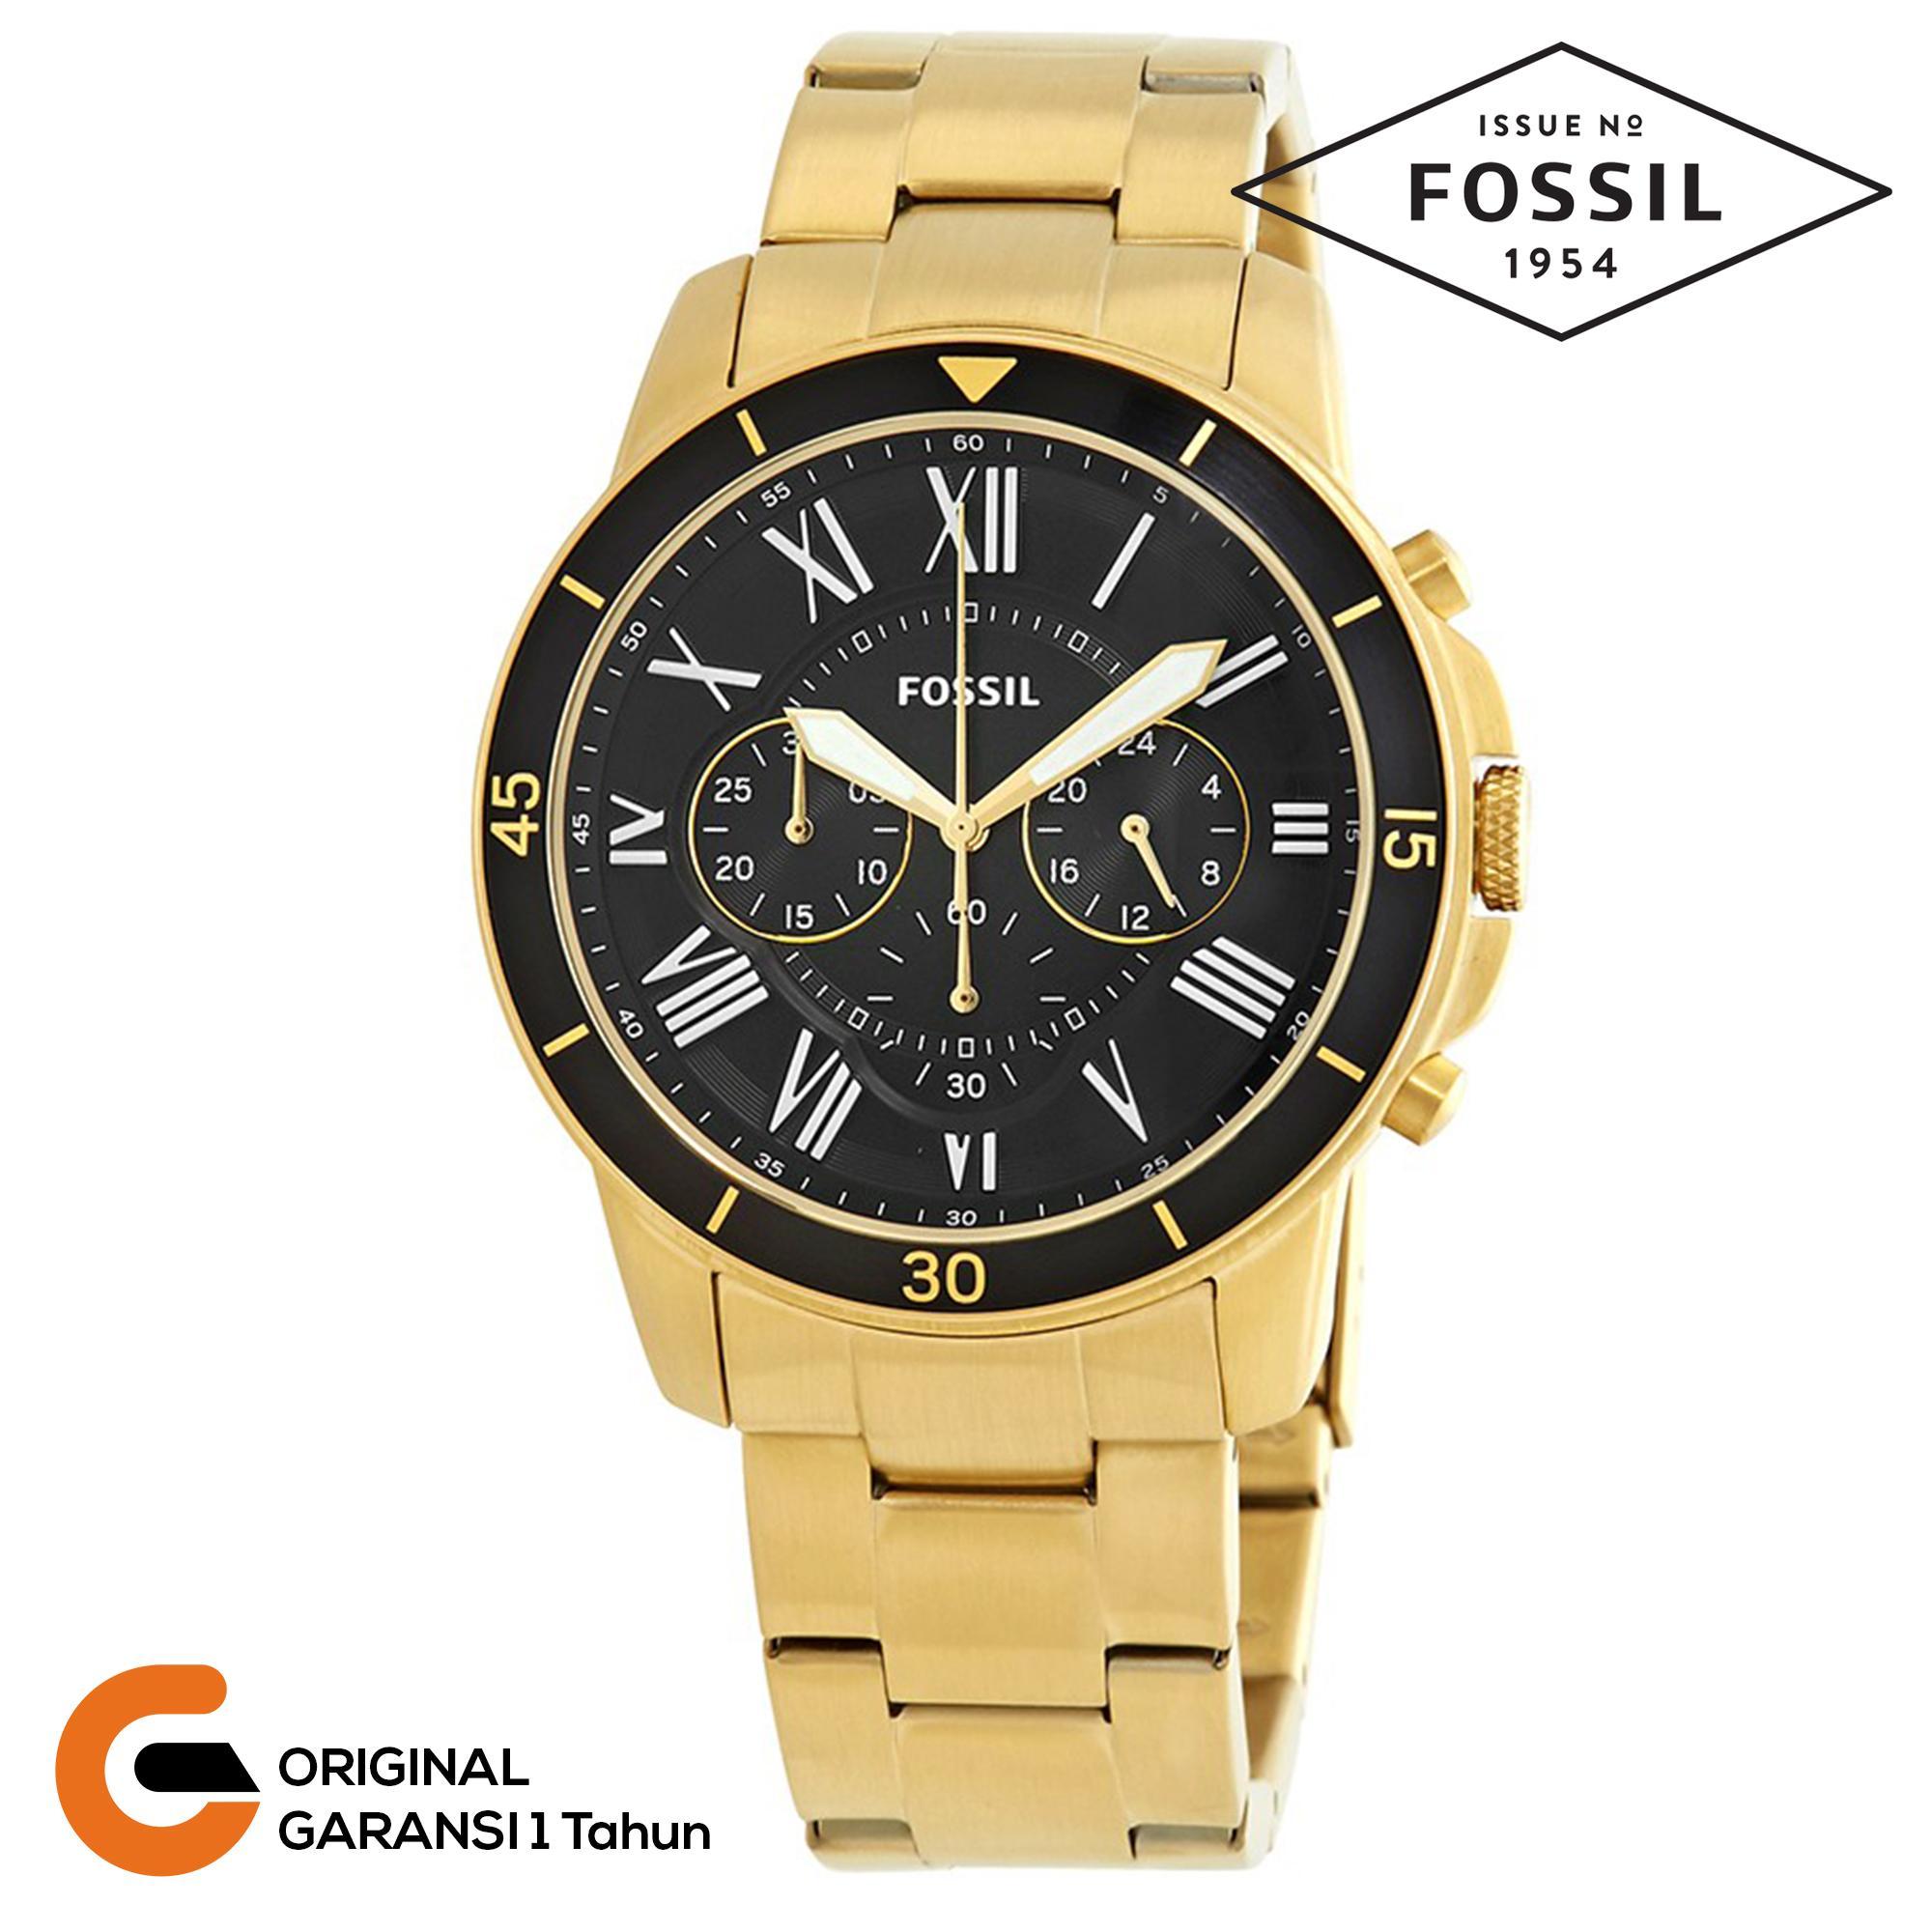 Fossil Pilot 54 Chronograph Jam Tangan Pria Tali Rantai Logam Tali Stainless Steel Quartz Movement Black